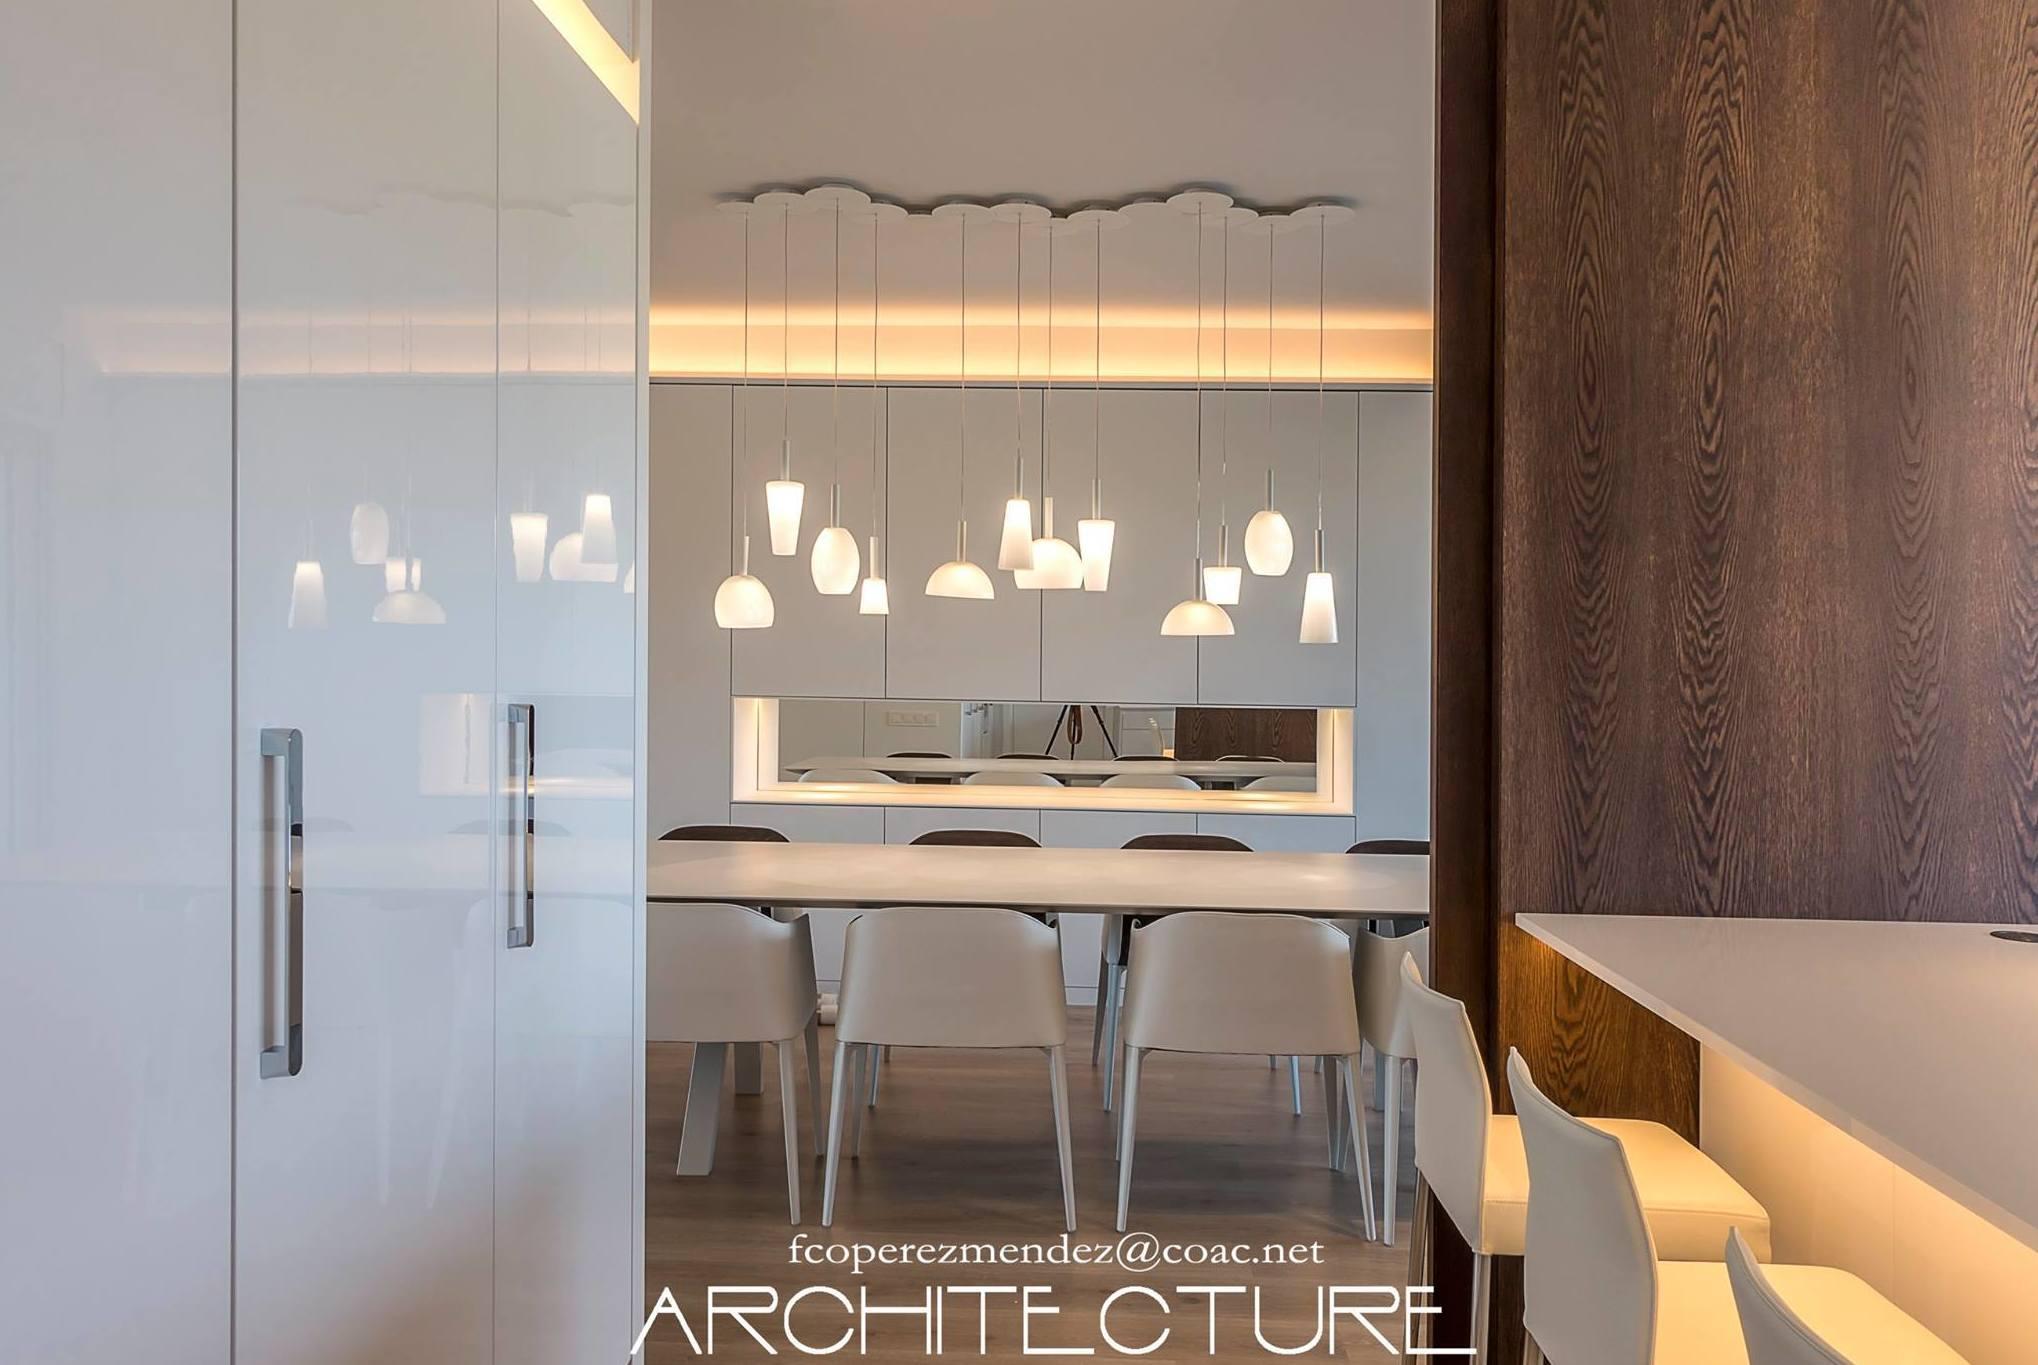 Estudio de arquitectura en Sitges